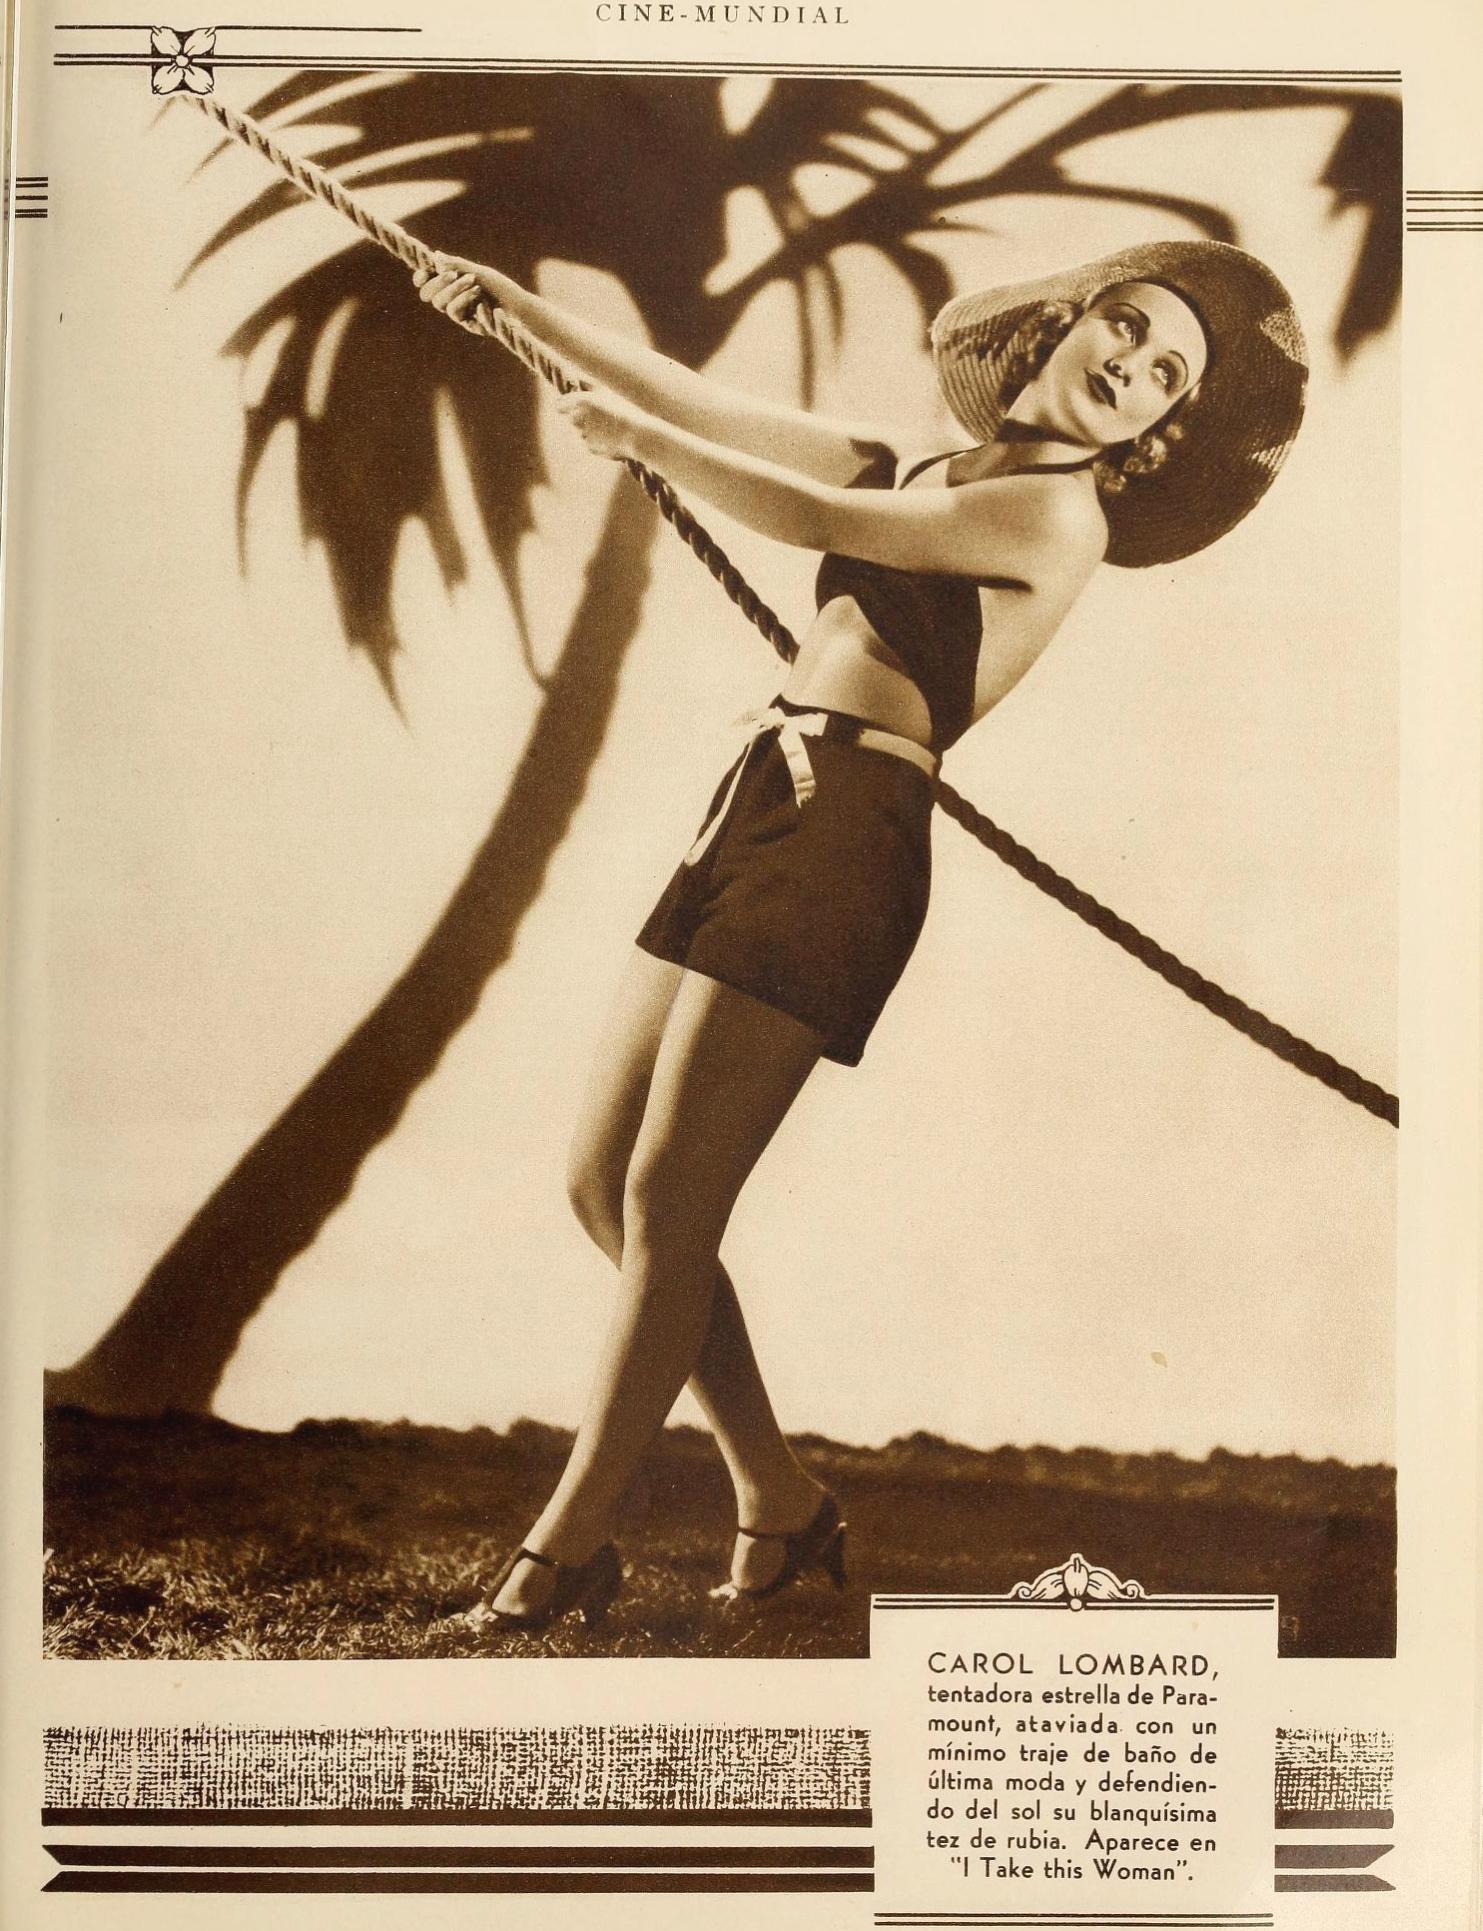 carole lombard cine mundial september 1931aa